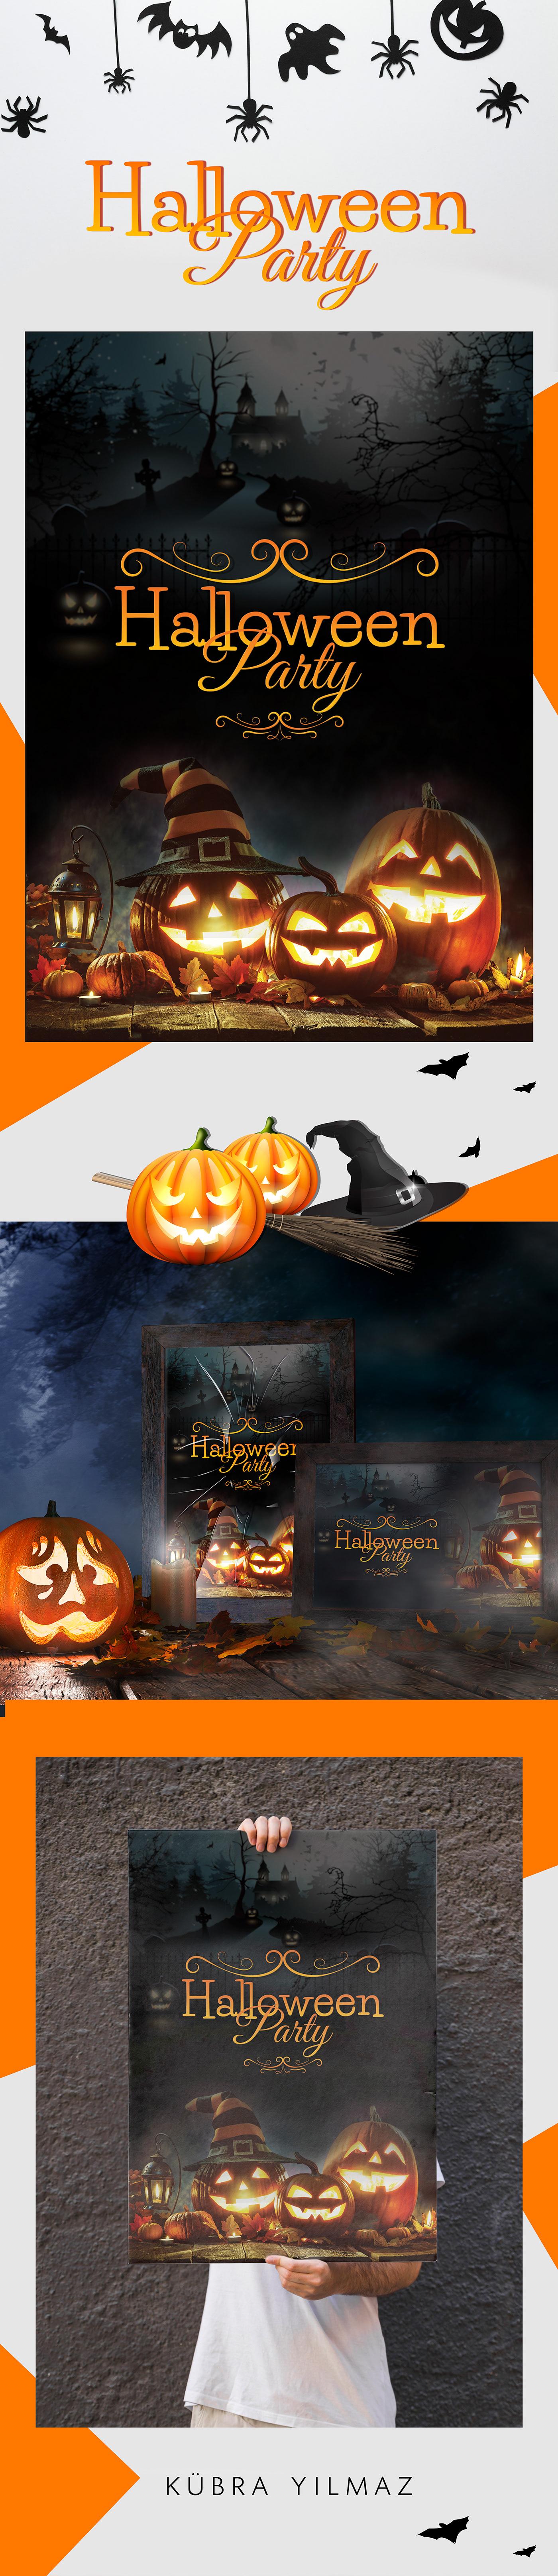 Image may contain: pumpkin, halloween and cartoon